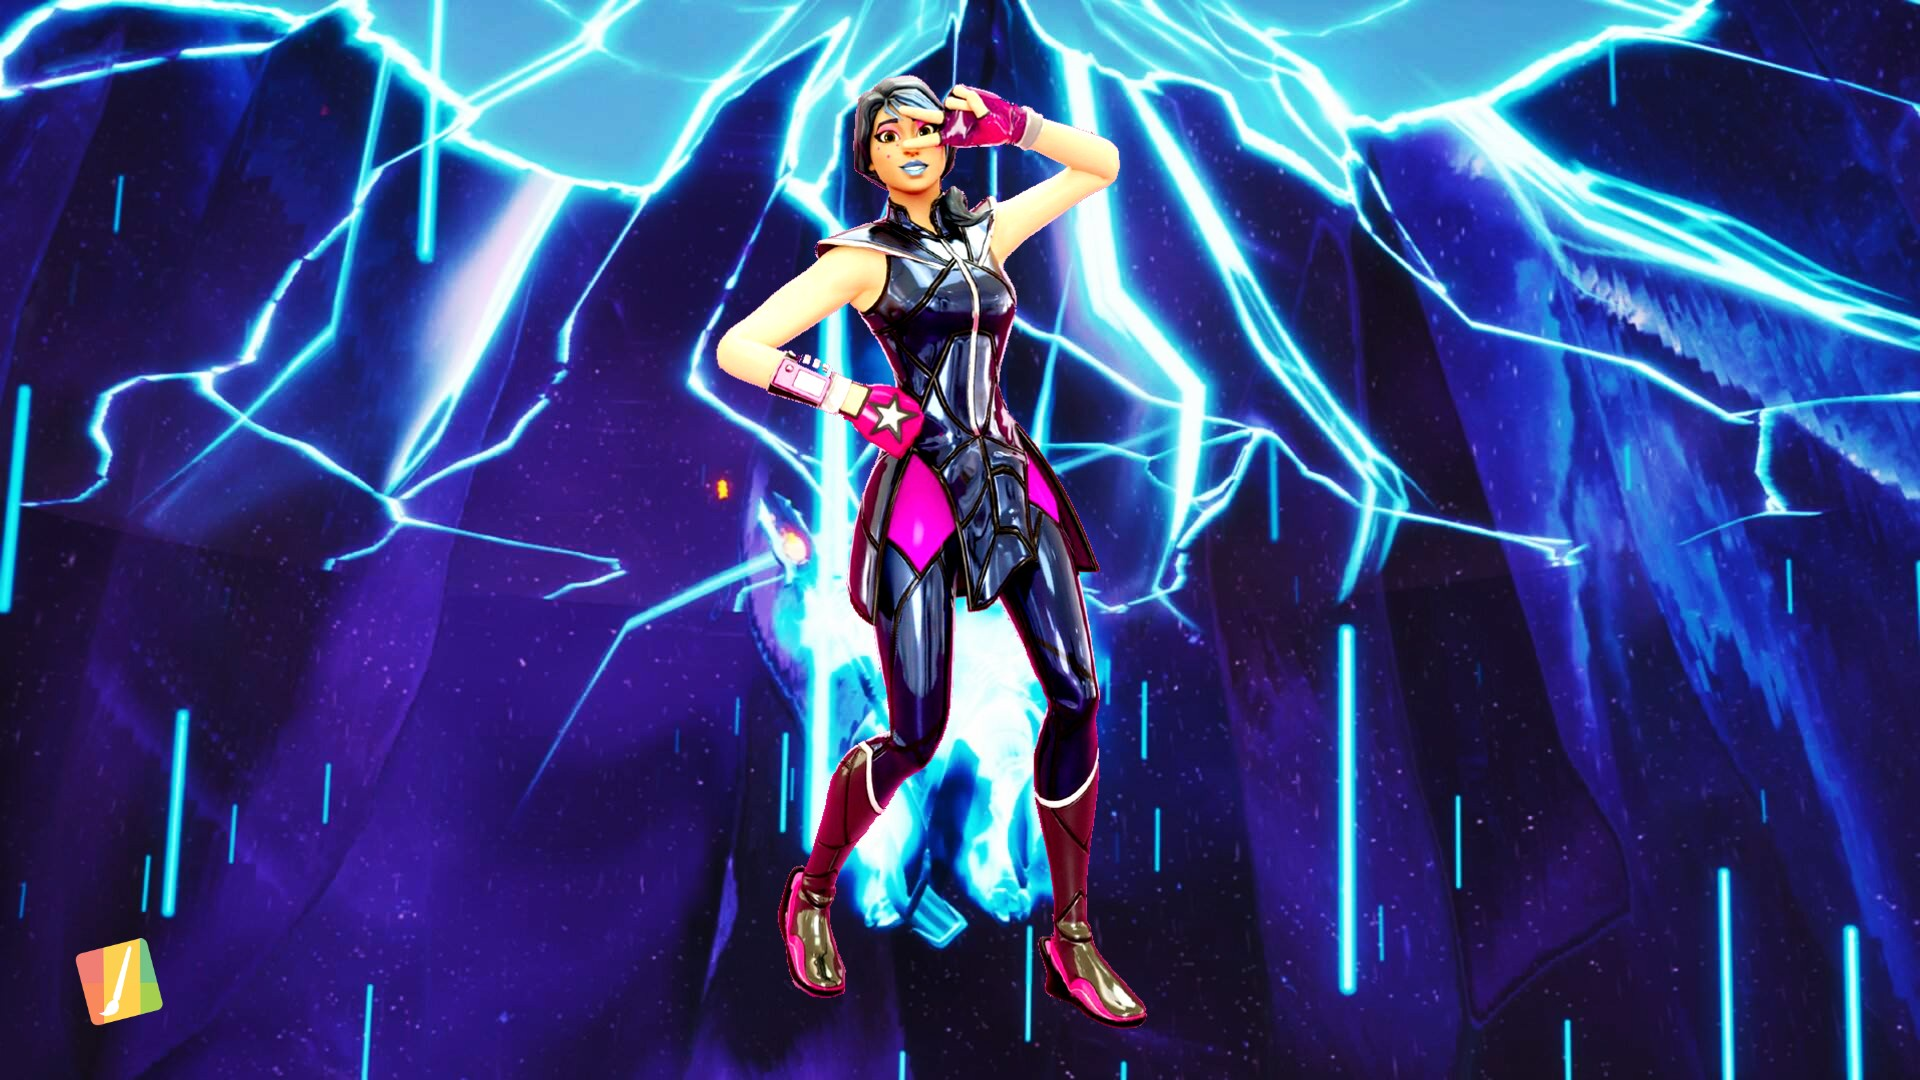 Sparkle Supreme Fortnite Season X Skin All Details Hq Wallpapers Supertab Themes